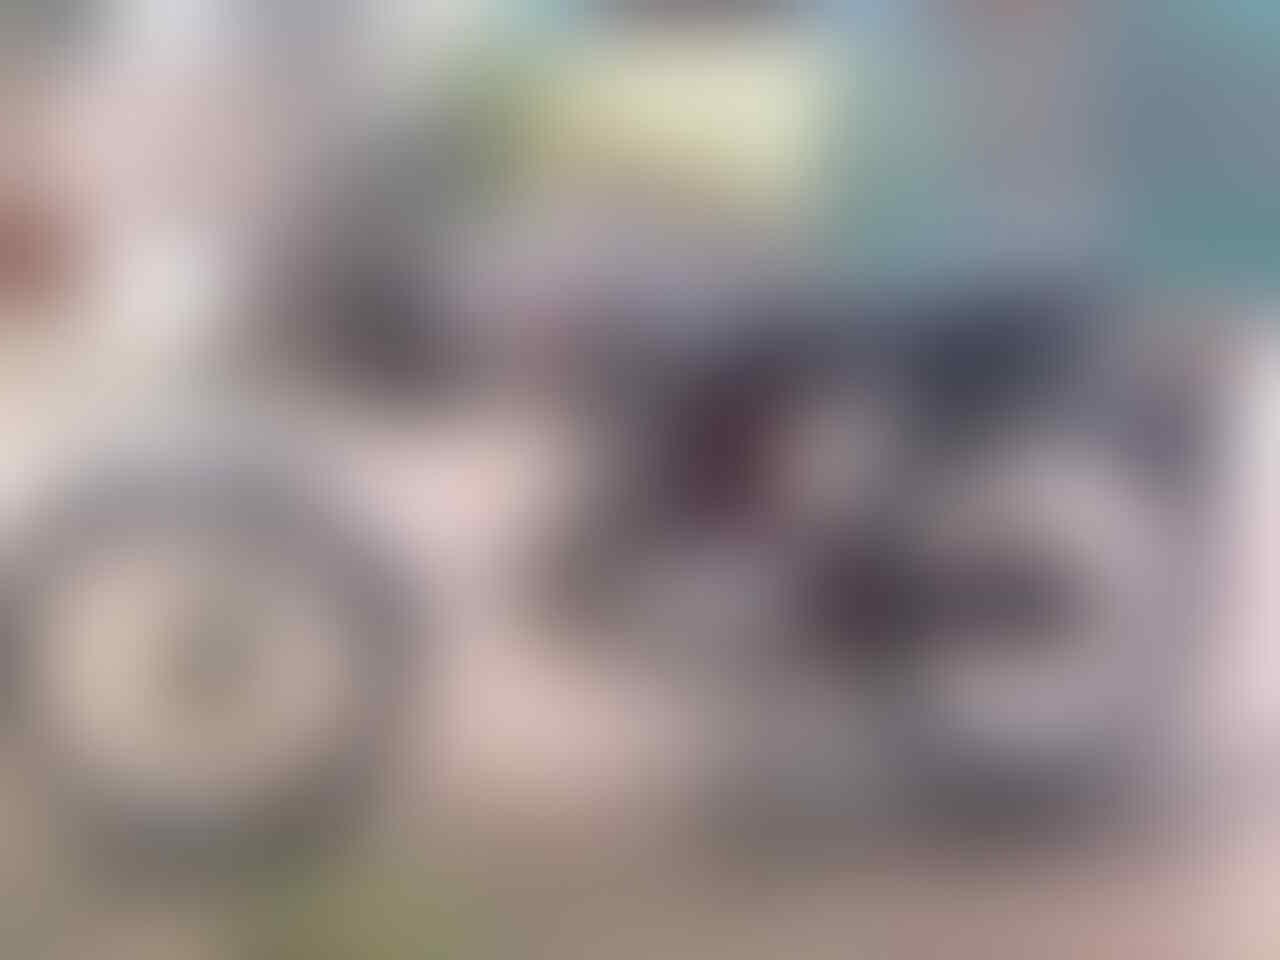 HONDA S90Z ASTRA '72 SURAT LENGKAP B-DKI PLAT IDUP POSISI DI CIKARANG